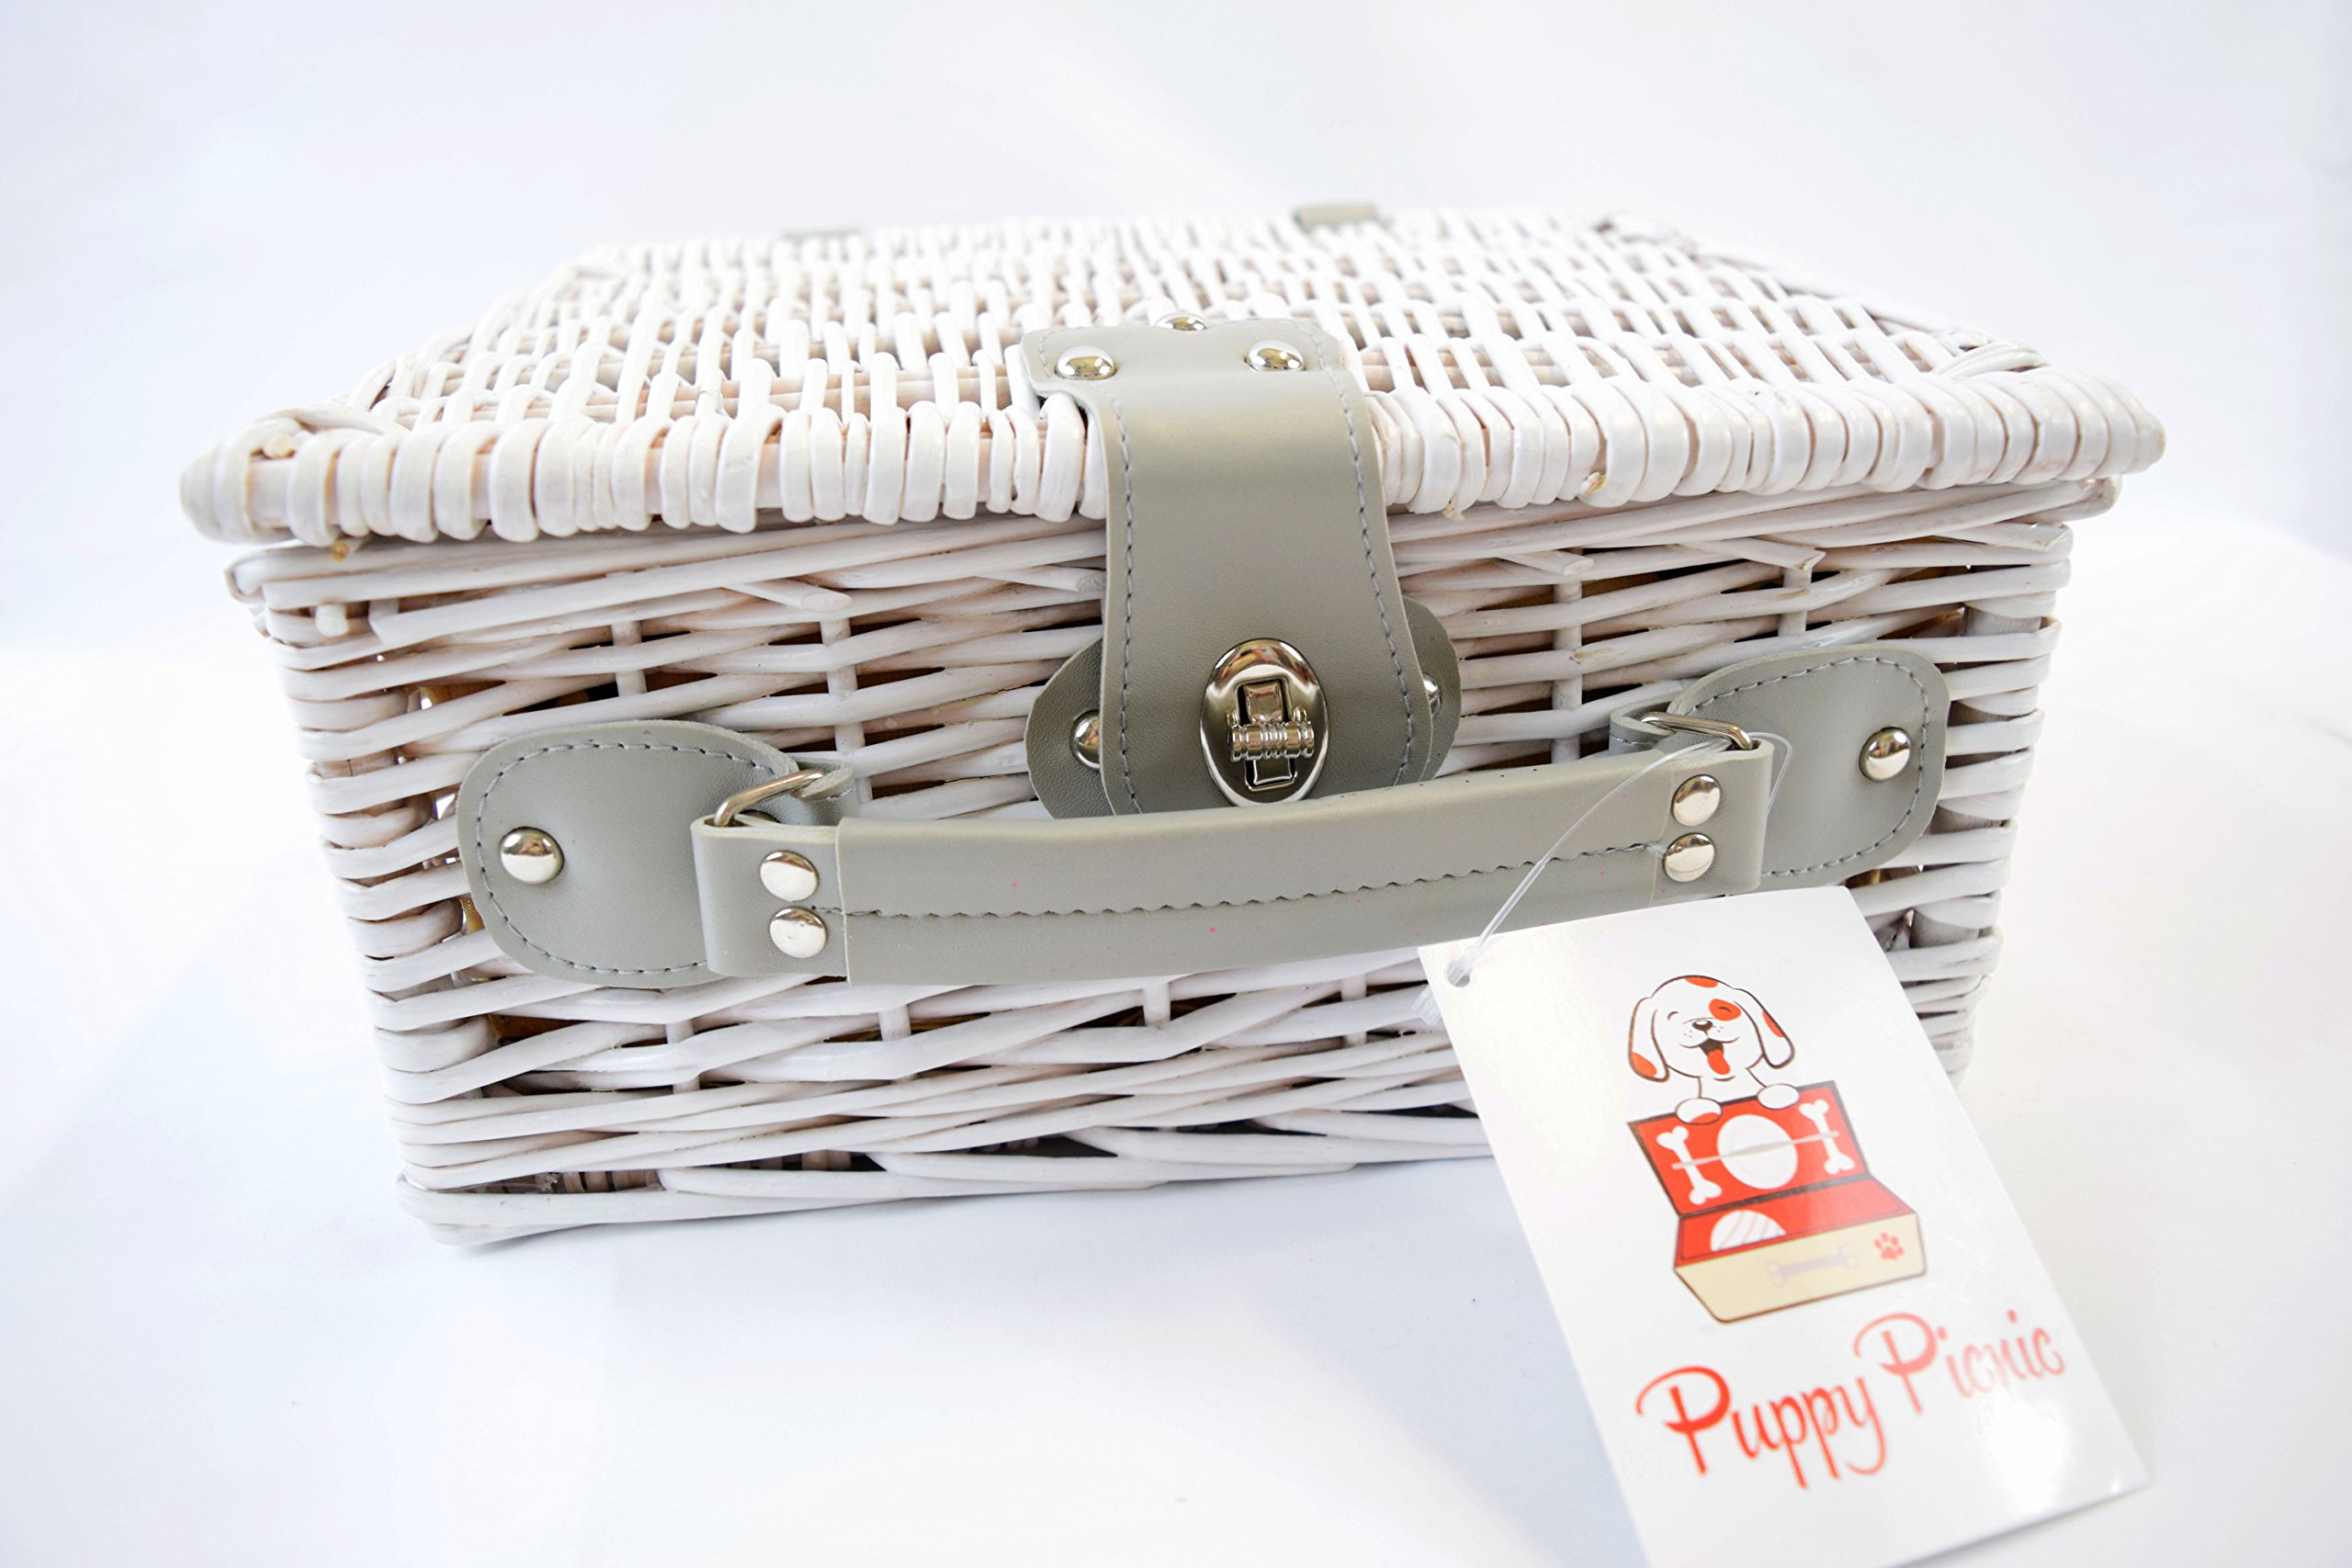 Dog Gift Basket with Dog Bowls, Dog Toy, Dog Brush - Puppy Picnic White Wicker Basket by Puppy Picnic